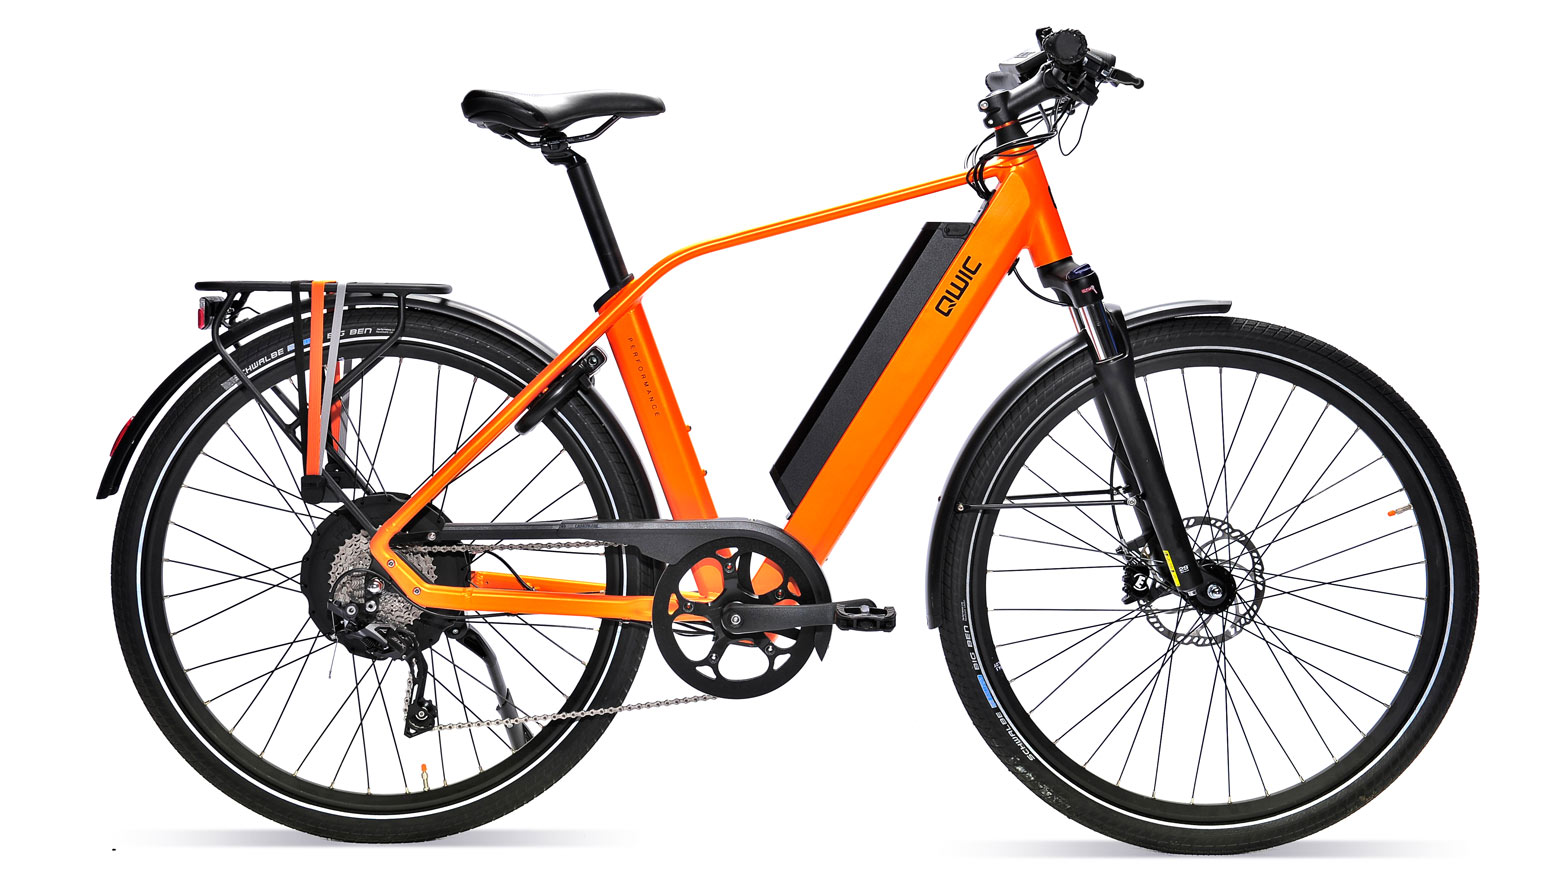 test urbanbike qwic performance rd10 schneidet gut ab im. Black Bedroom Furniture Sets. Home Design Ideas